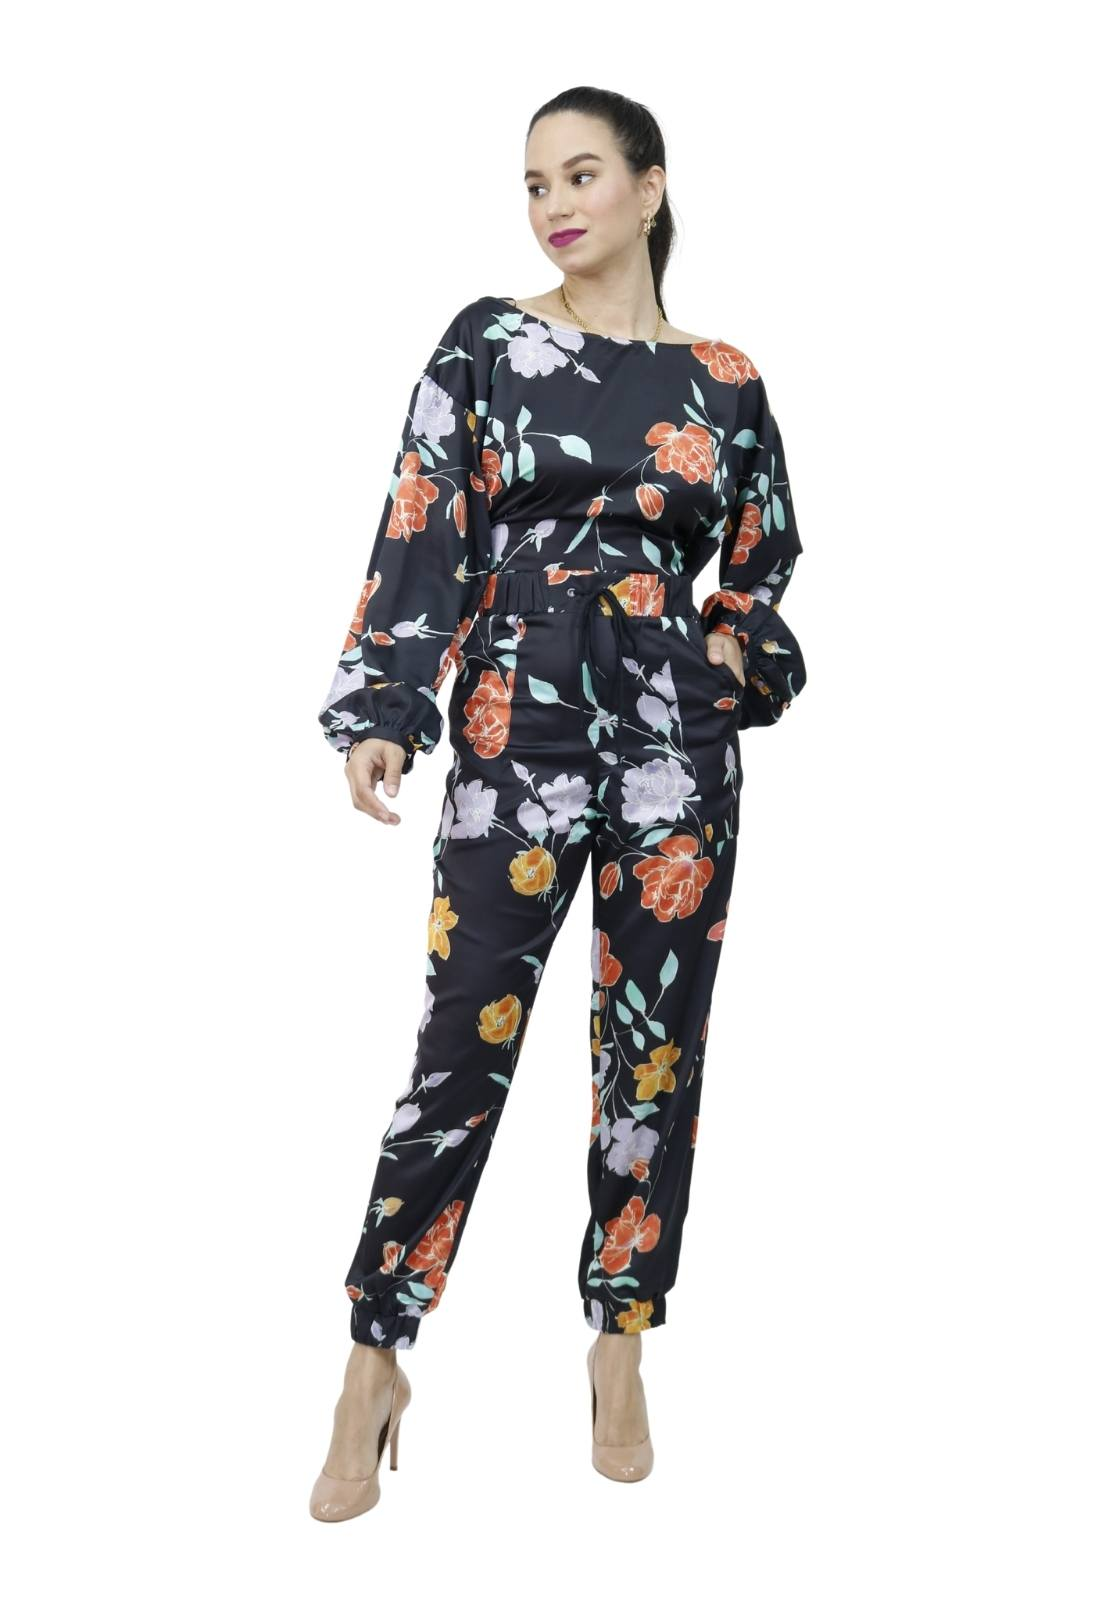 Conjunto Feminino Seda Blusa e Calça Jogging Estampa Floral